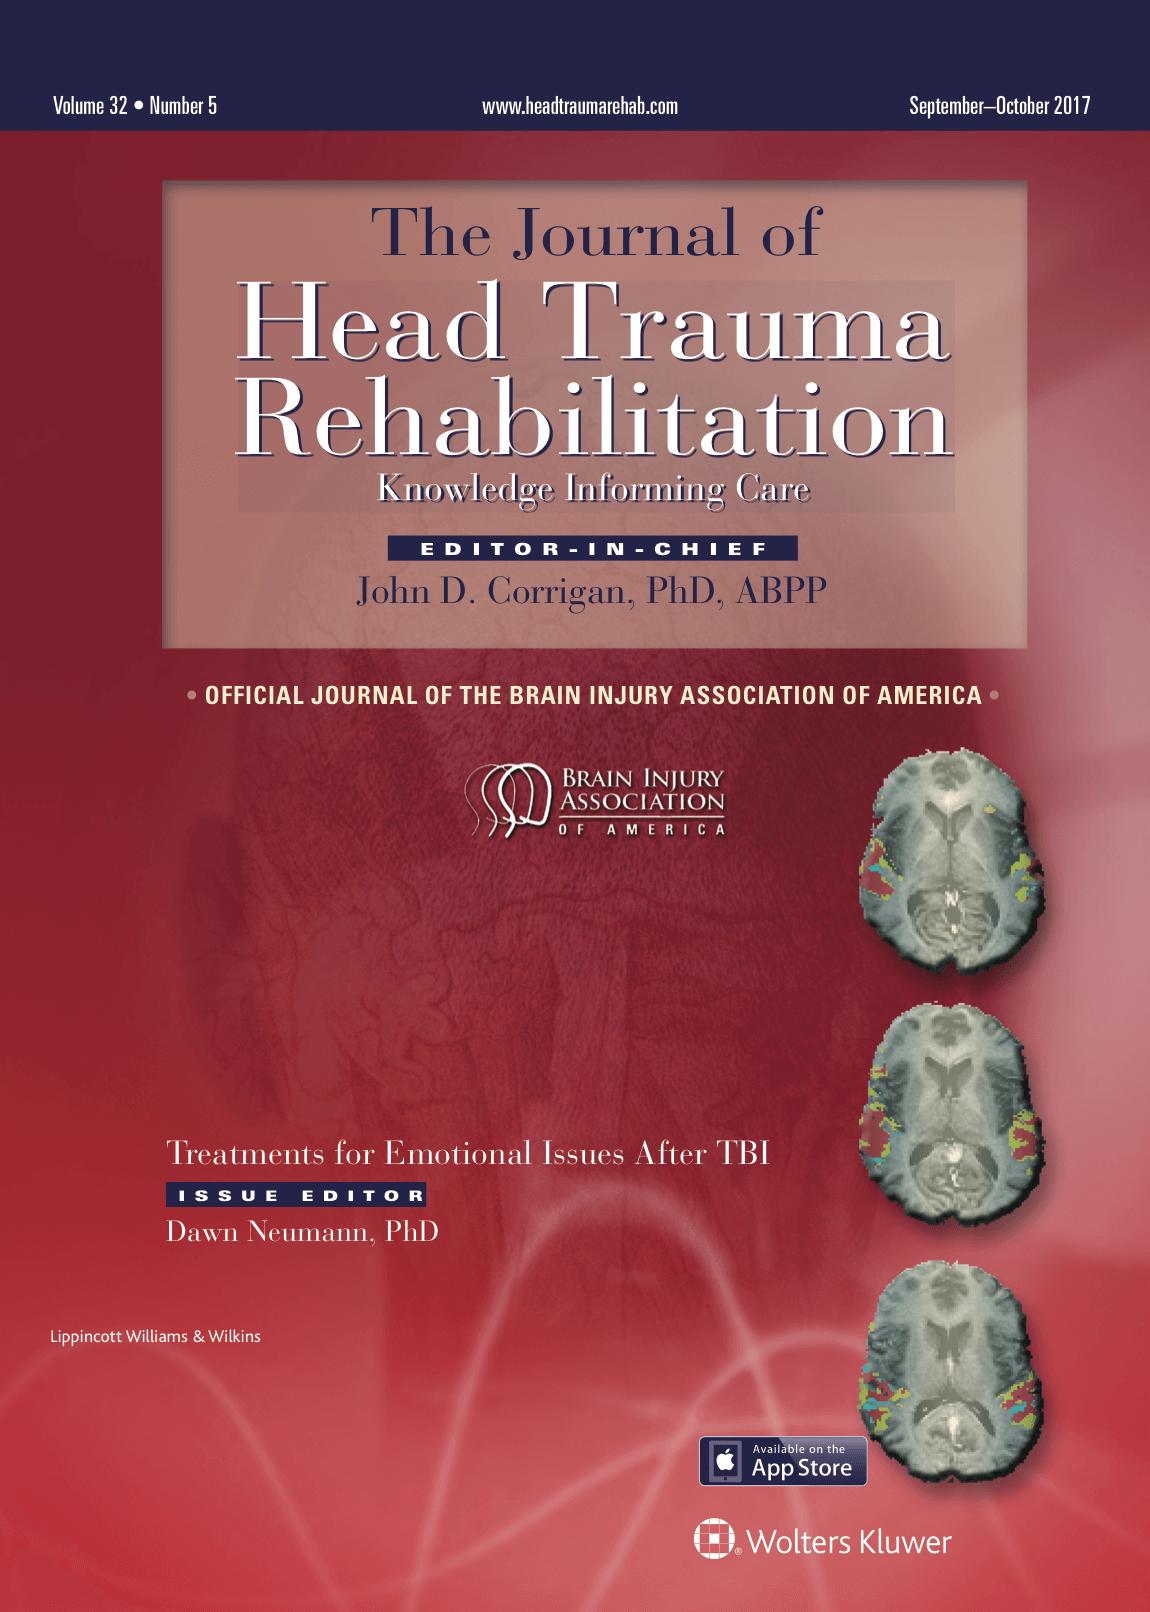 Journal of Head Trauma Rehabilitation Subscription